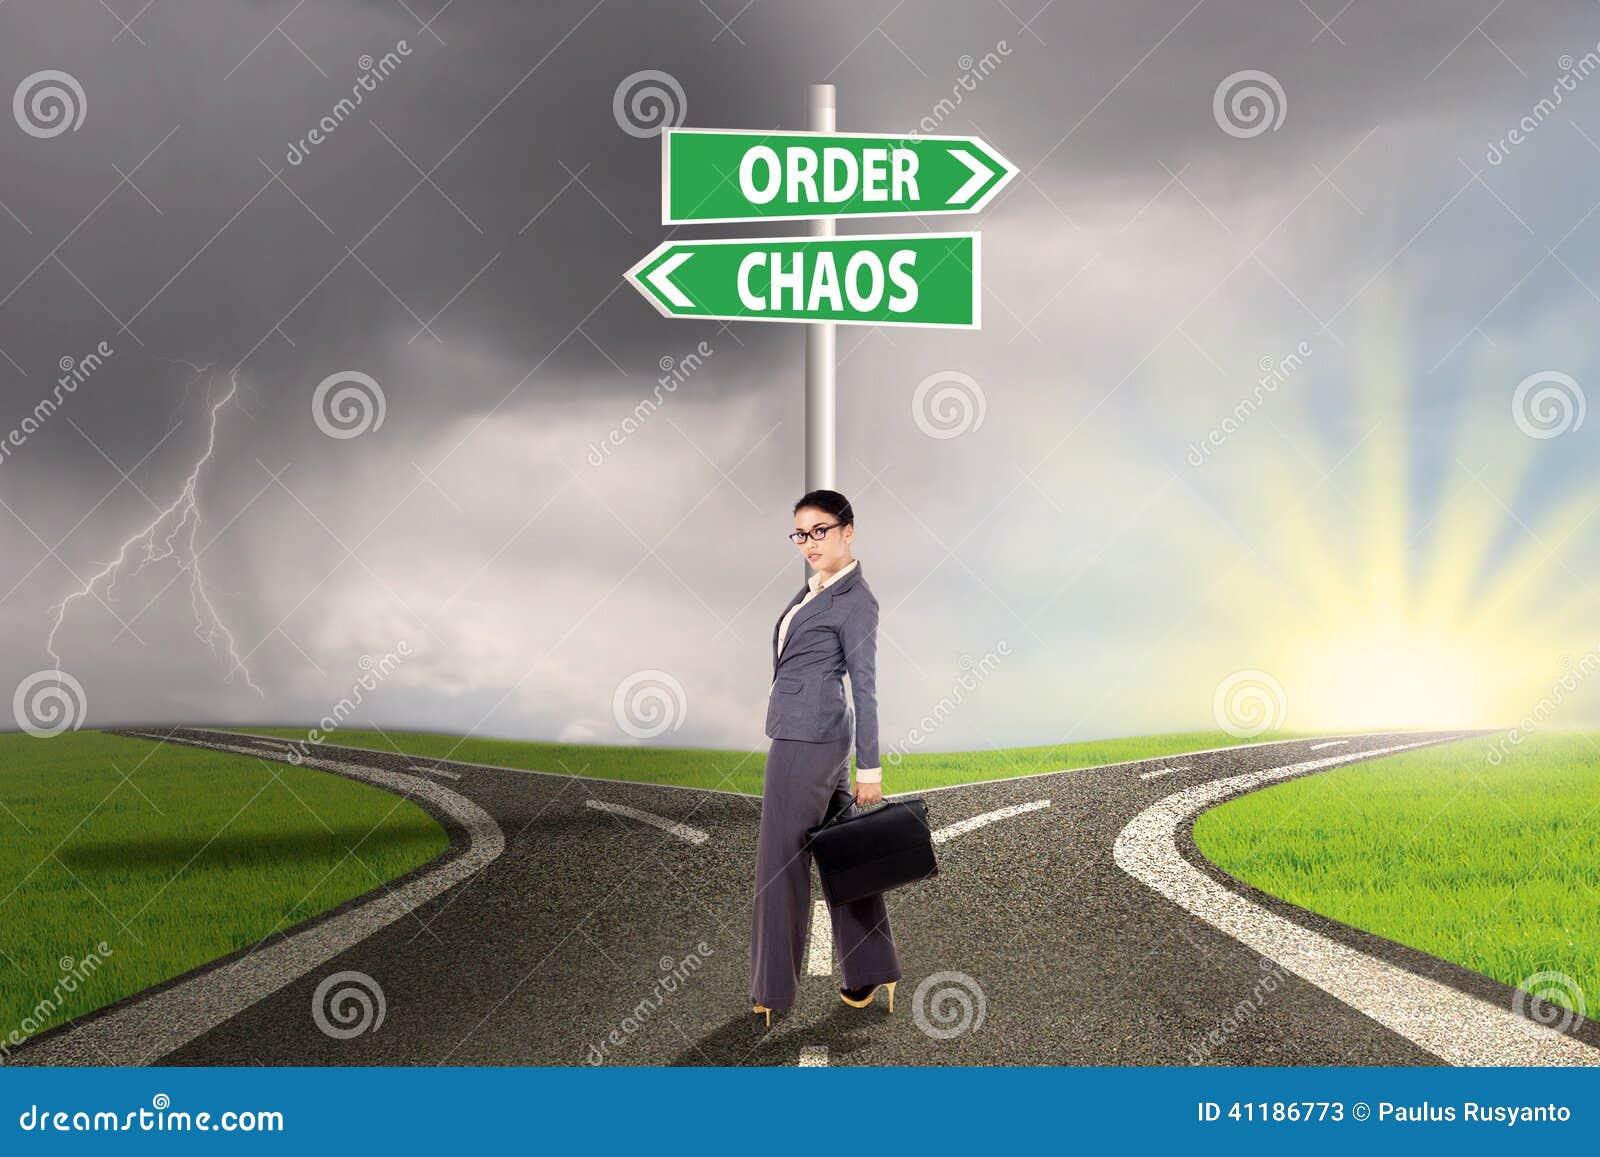 Chaos en ordekeus 3